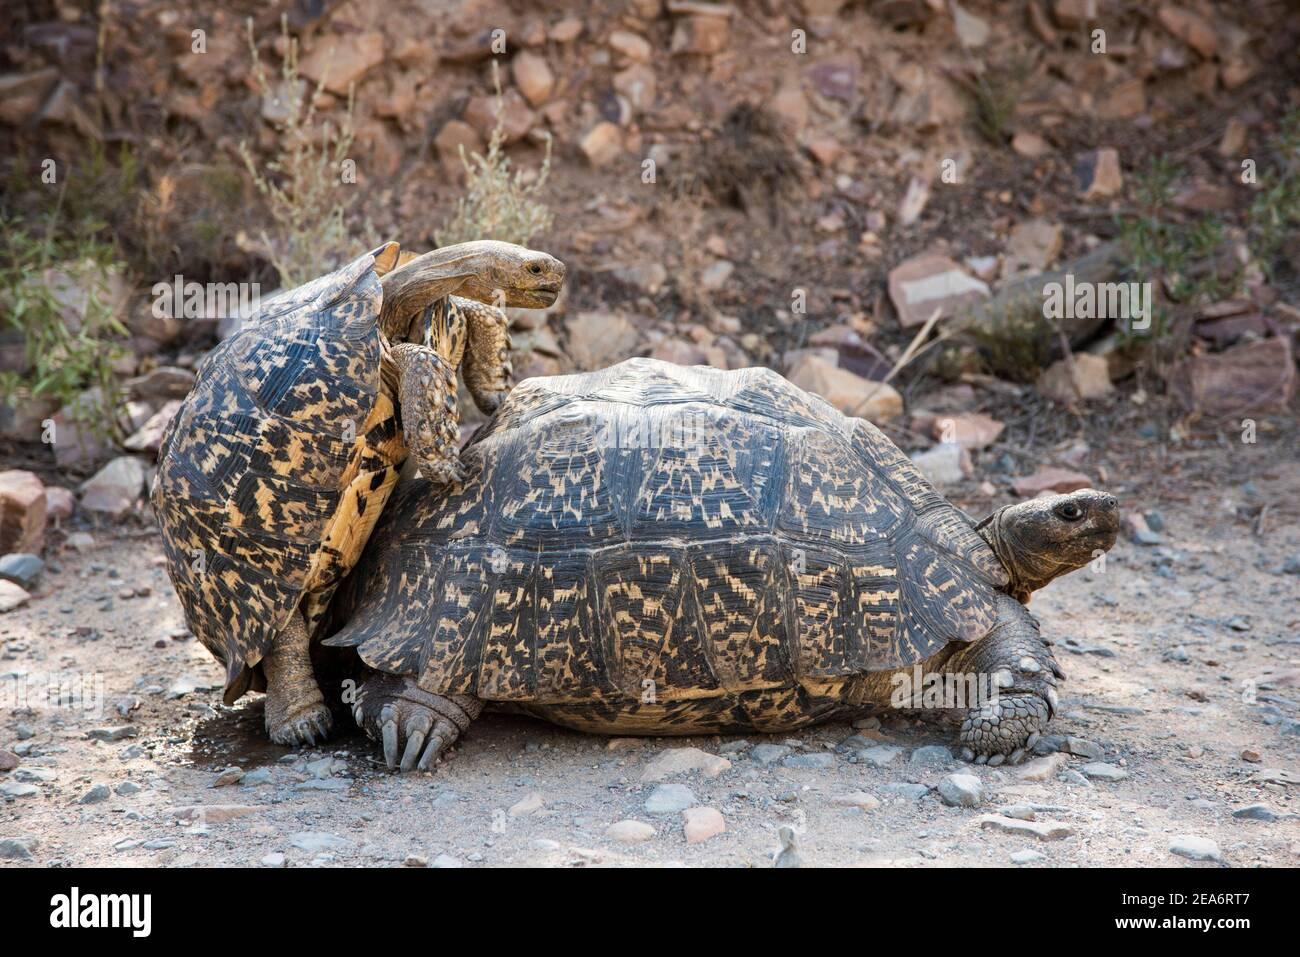 Apareamiento de tortuga leopardo, Geochelone pardalis, Baviaanskloof, Sudáfrica Foto de stock